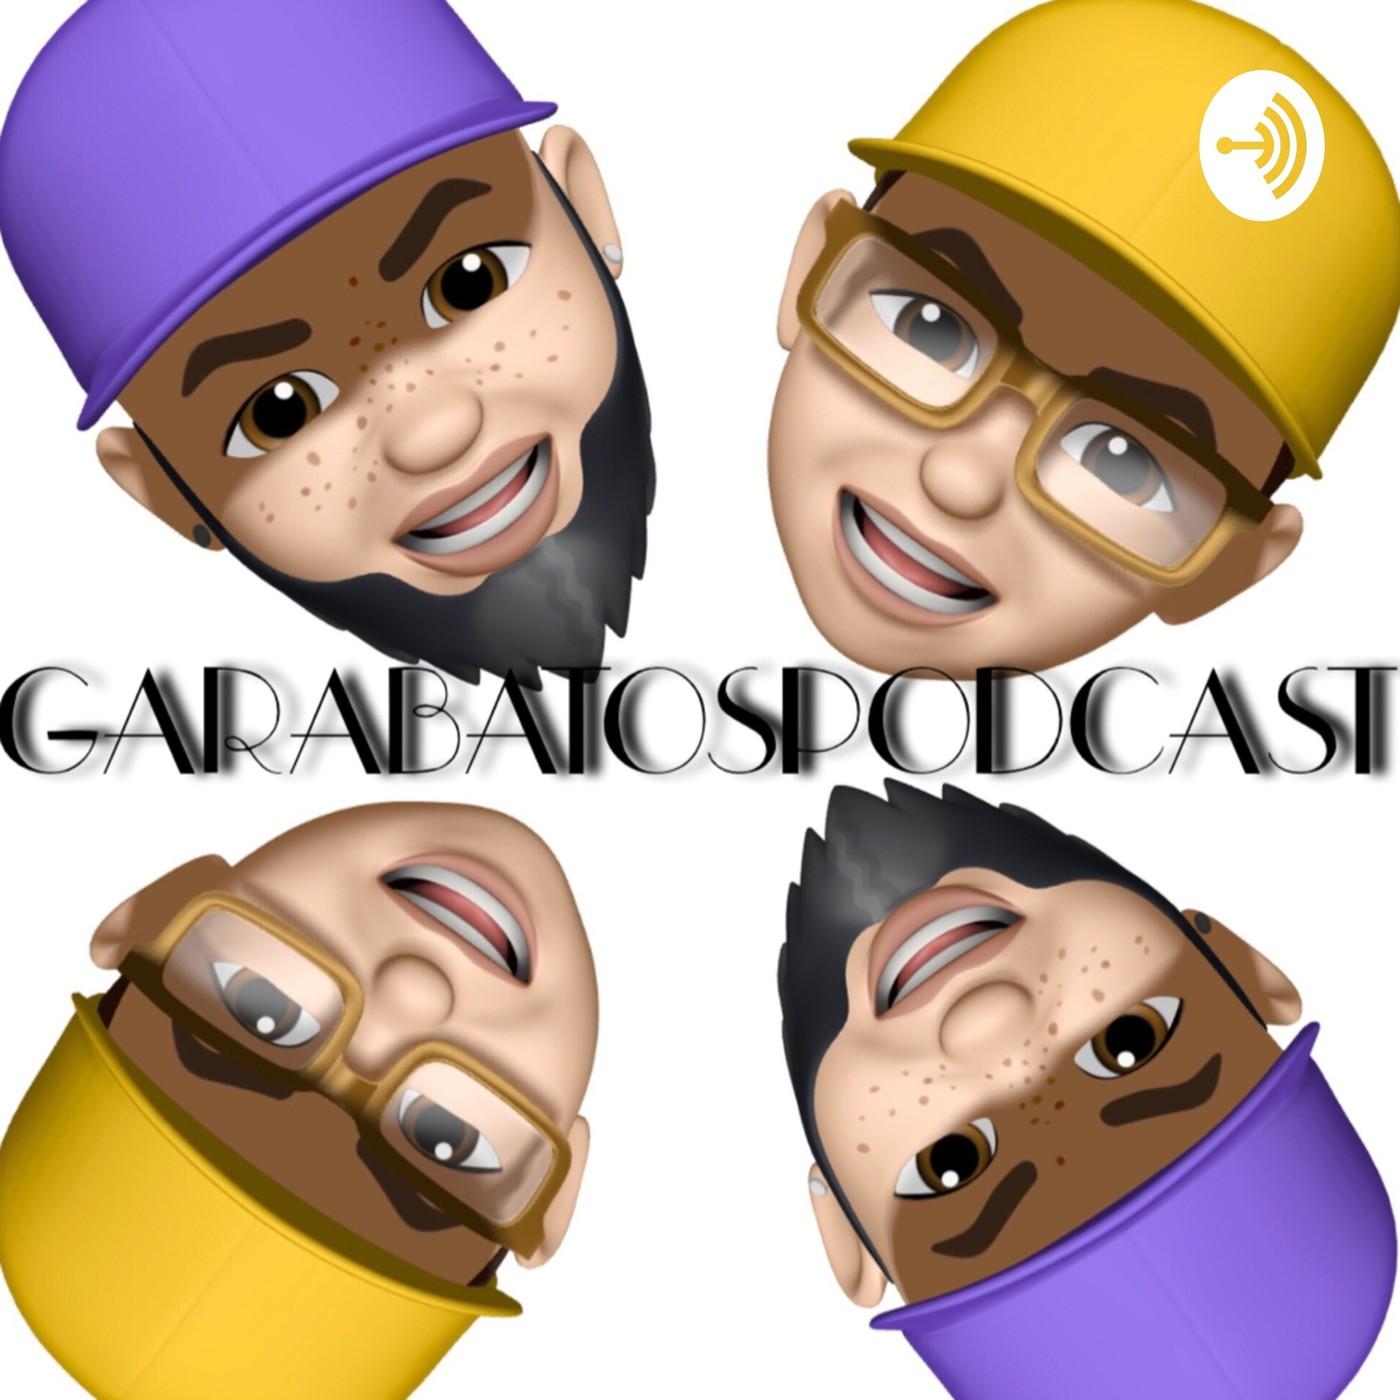 garabatos podcast